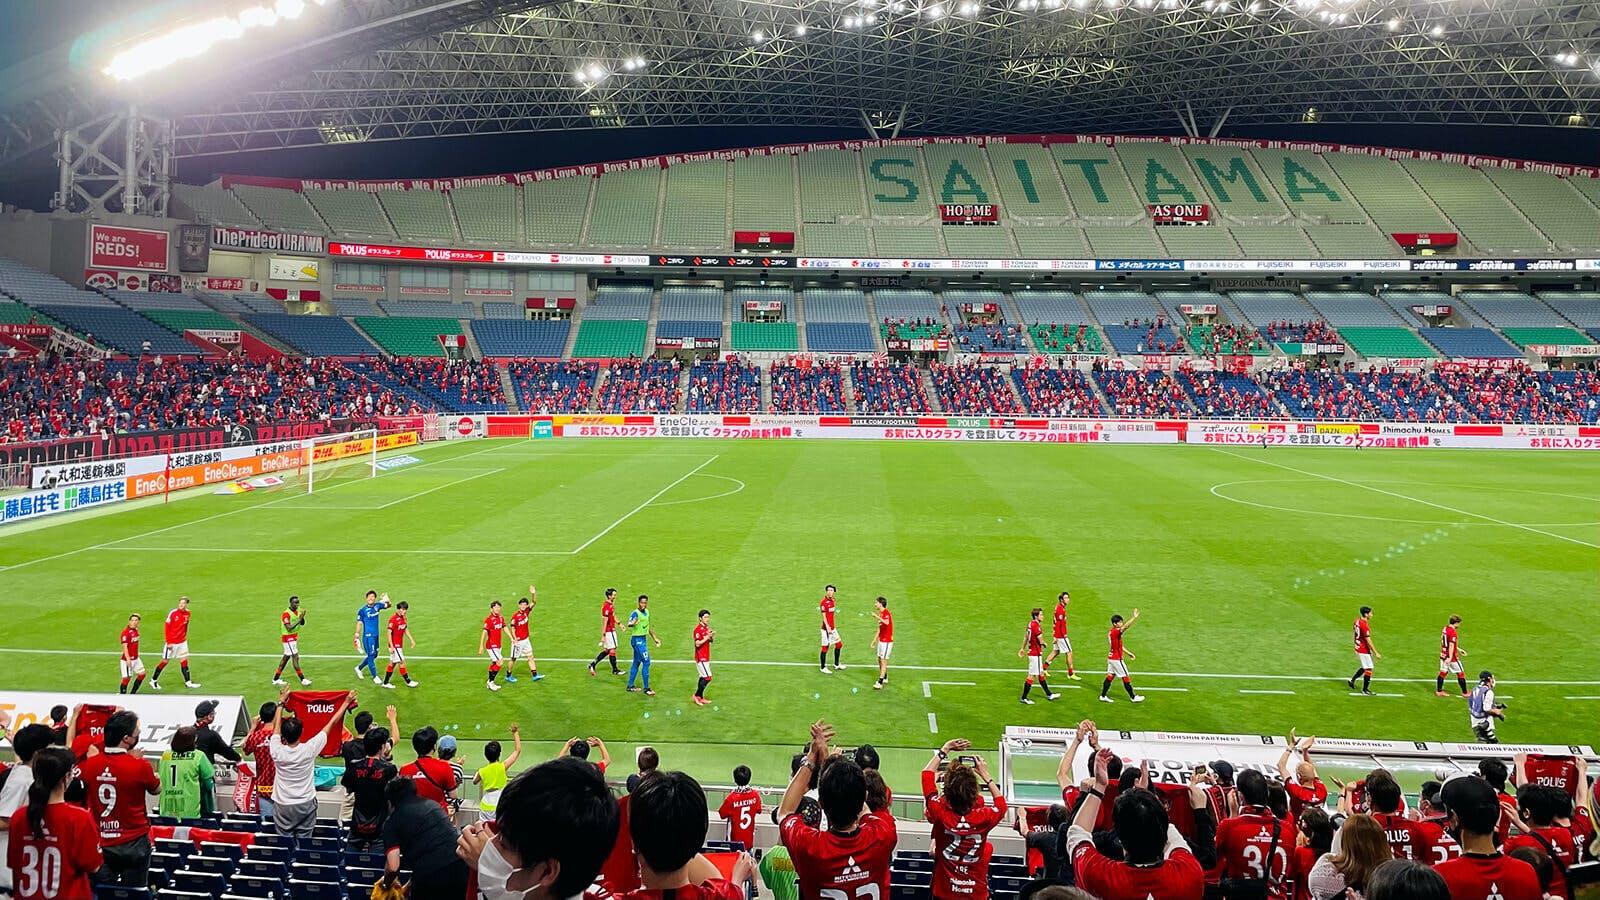 2021 Jリーグ 第20節 埼玉スタジアム2002 アビスパ福岡戦 試合終了後の様子